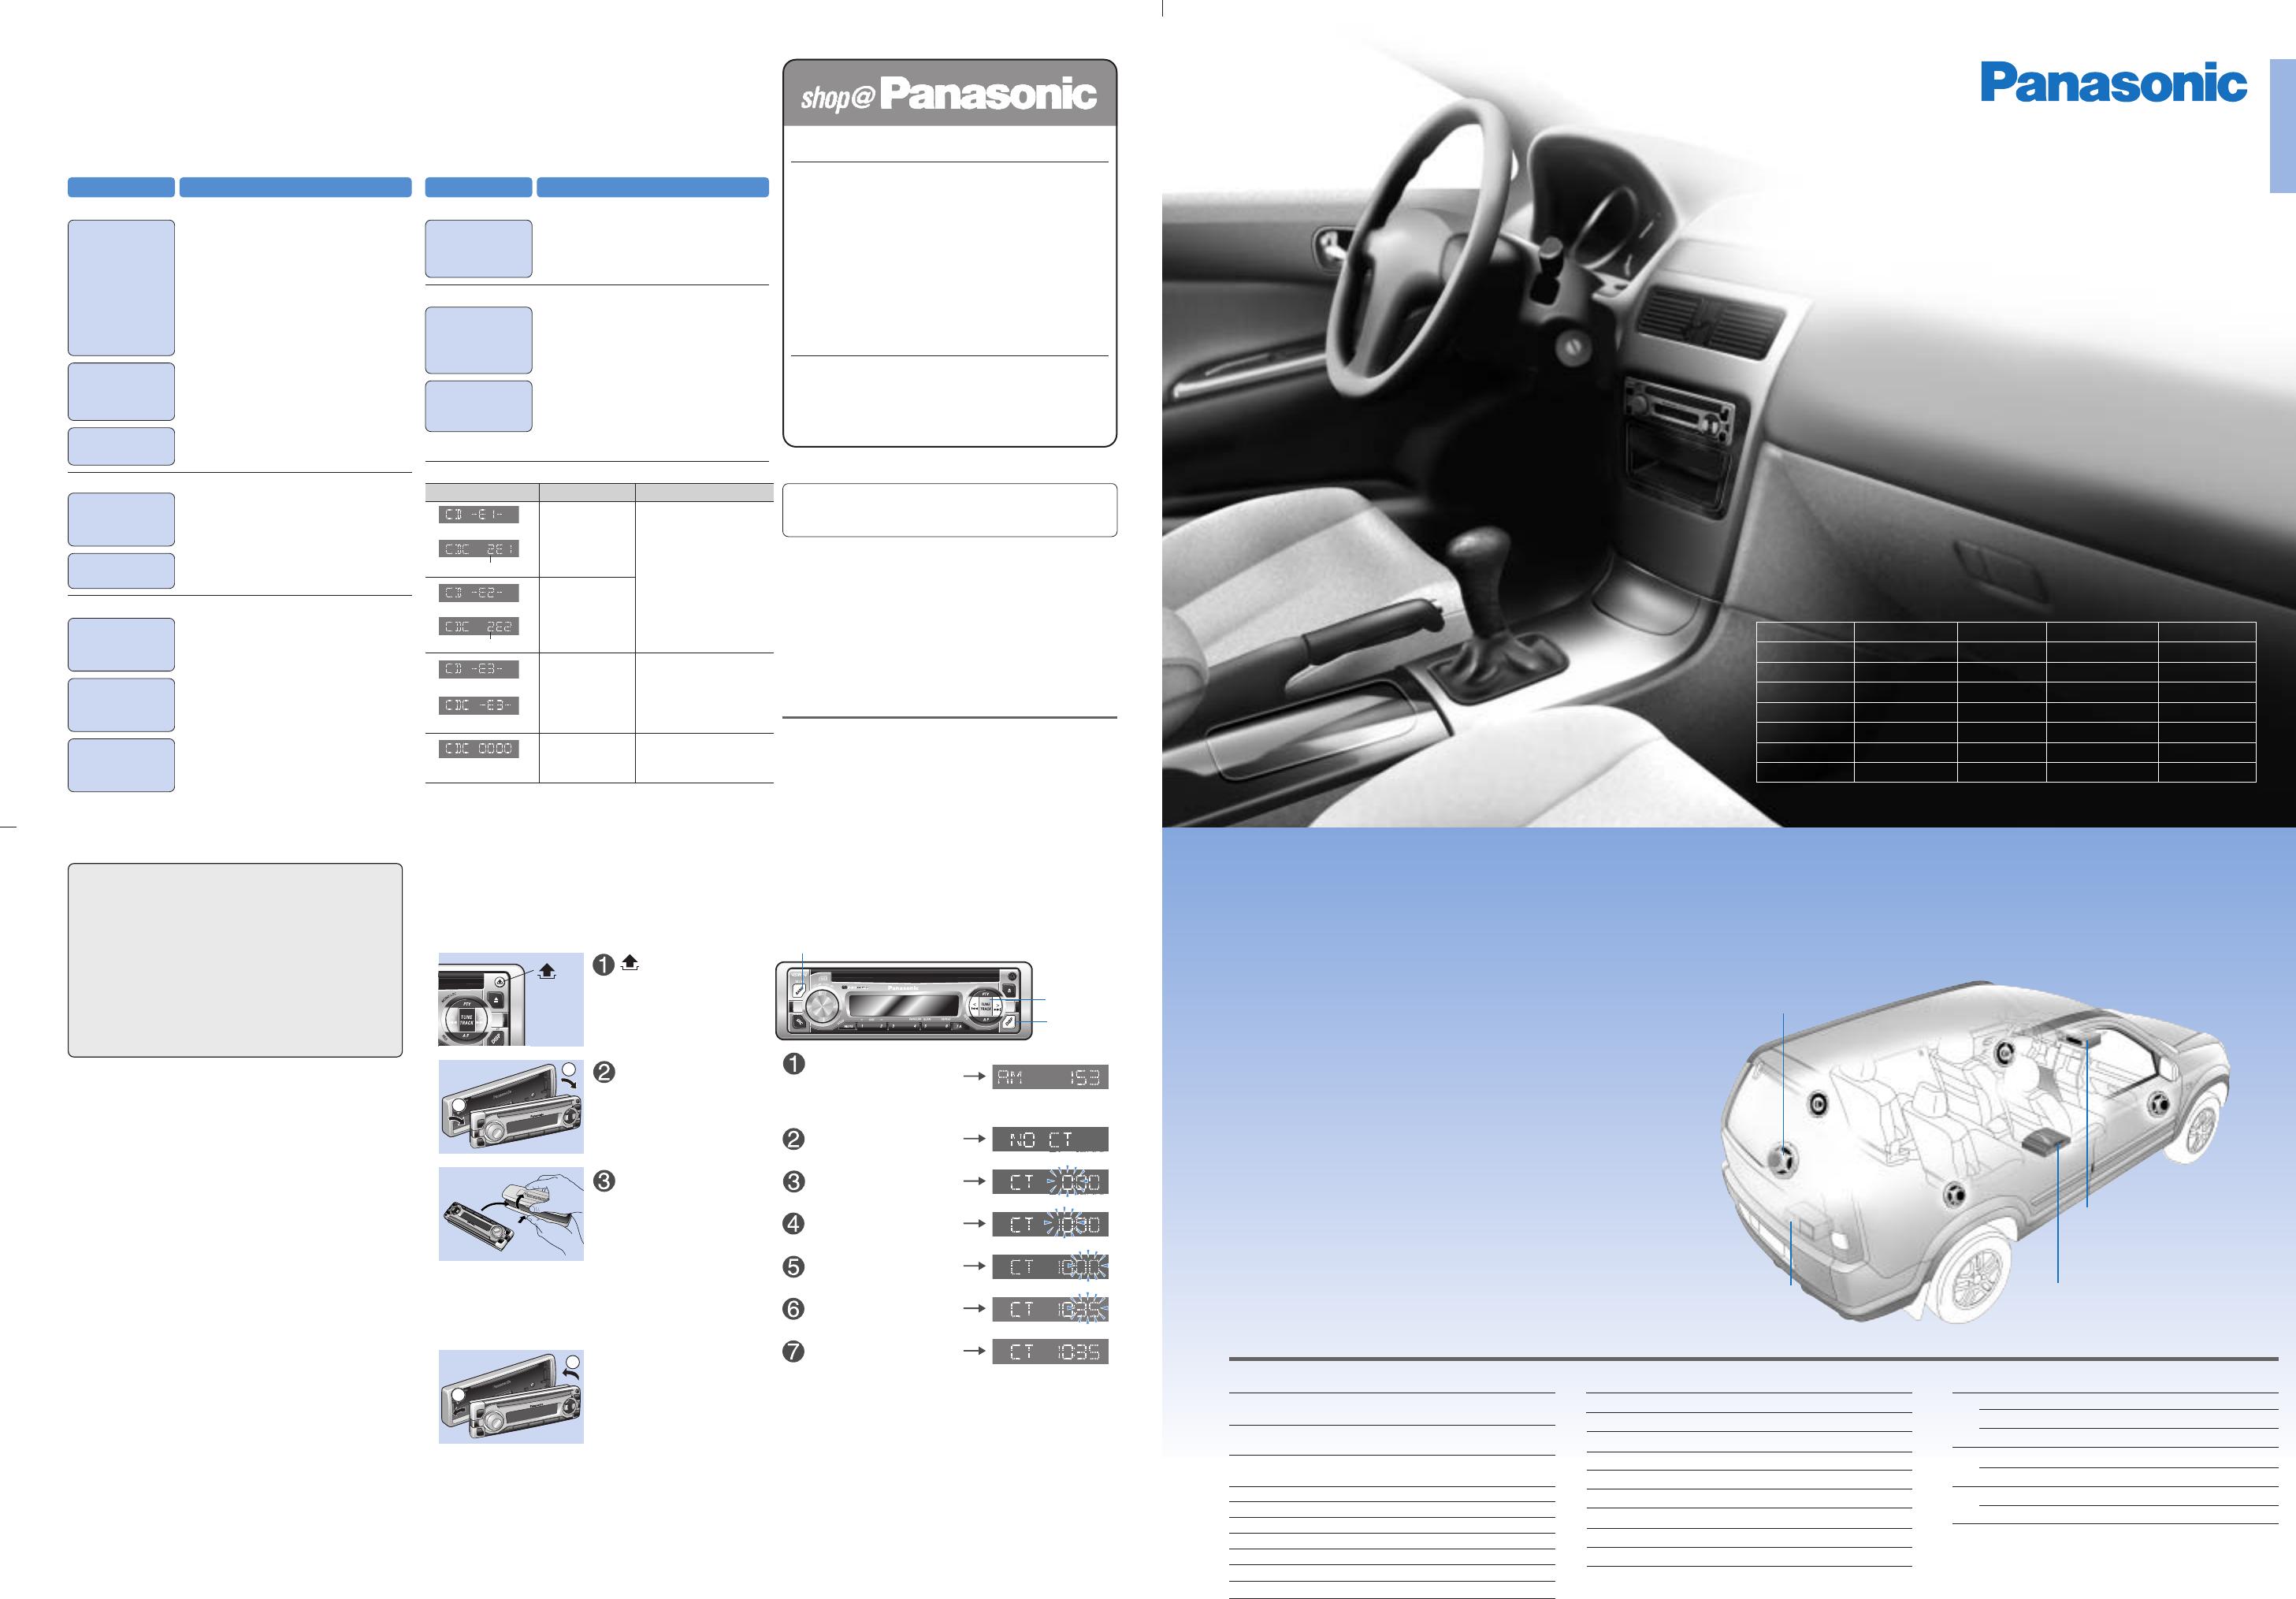 Handleiding Panasonic cq-rdp123n (pagina 1 van 5) (English)